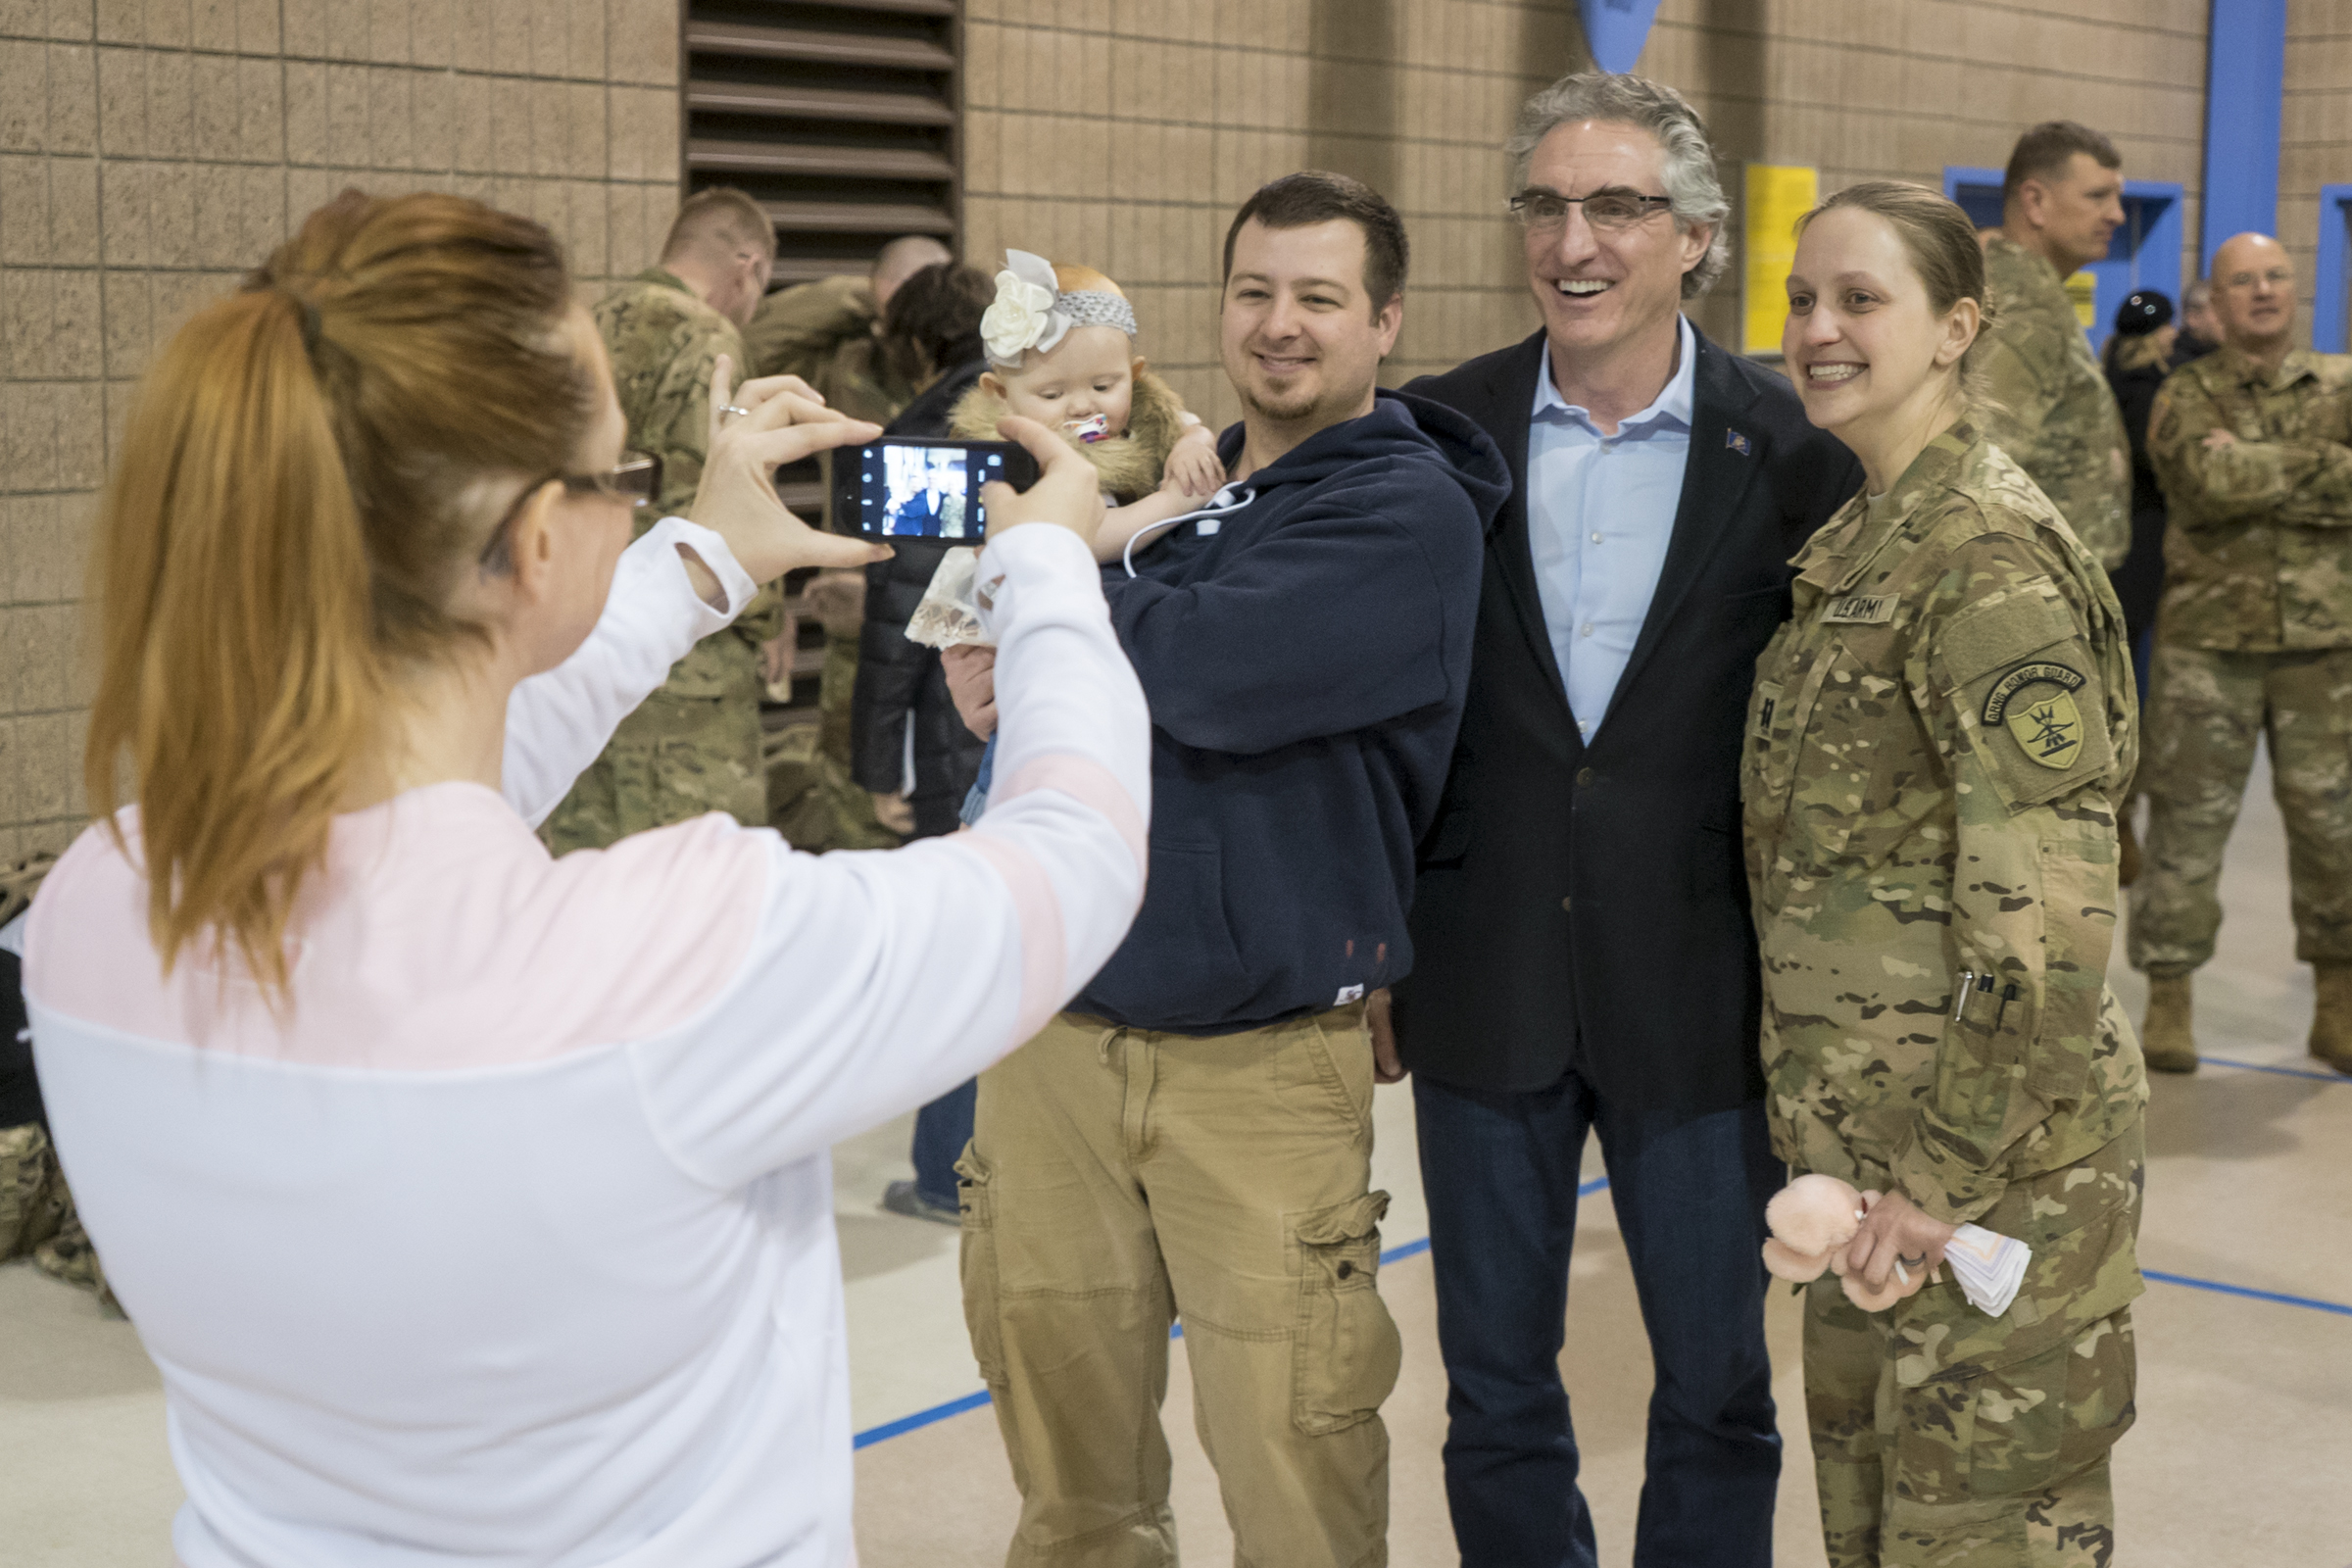 North Dakota governor signs 'constitutional carry' handgun bill into law